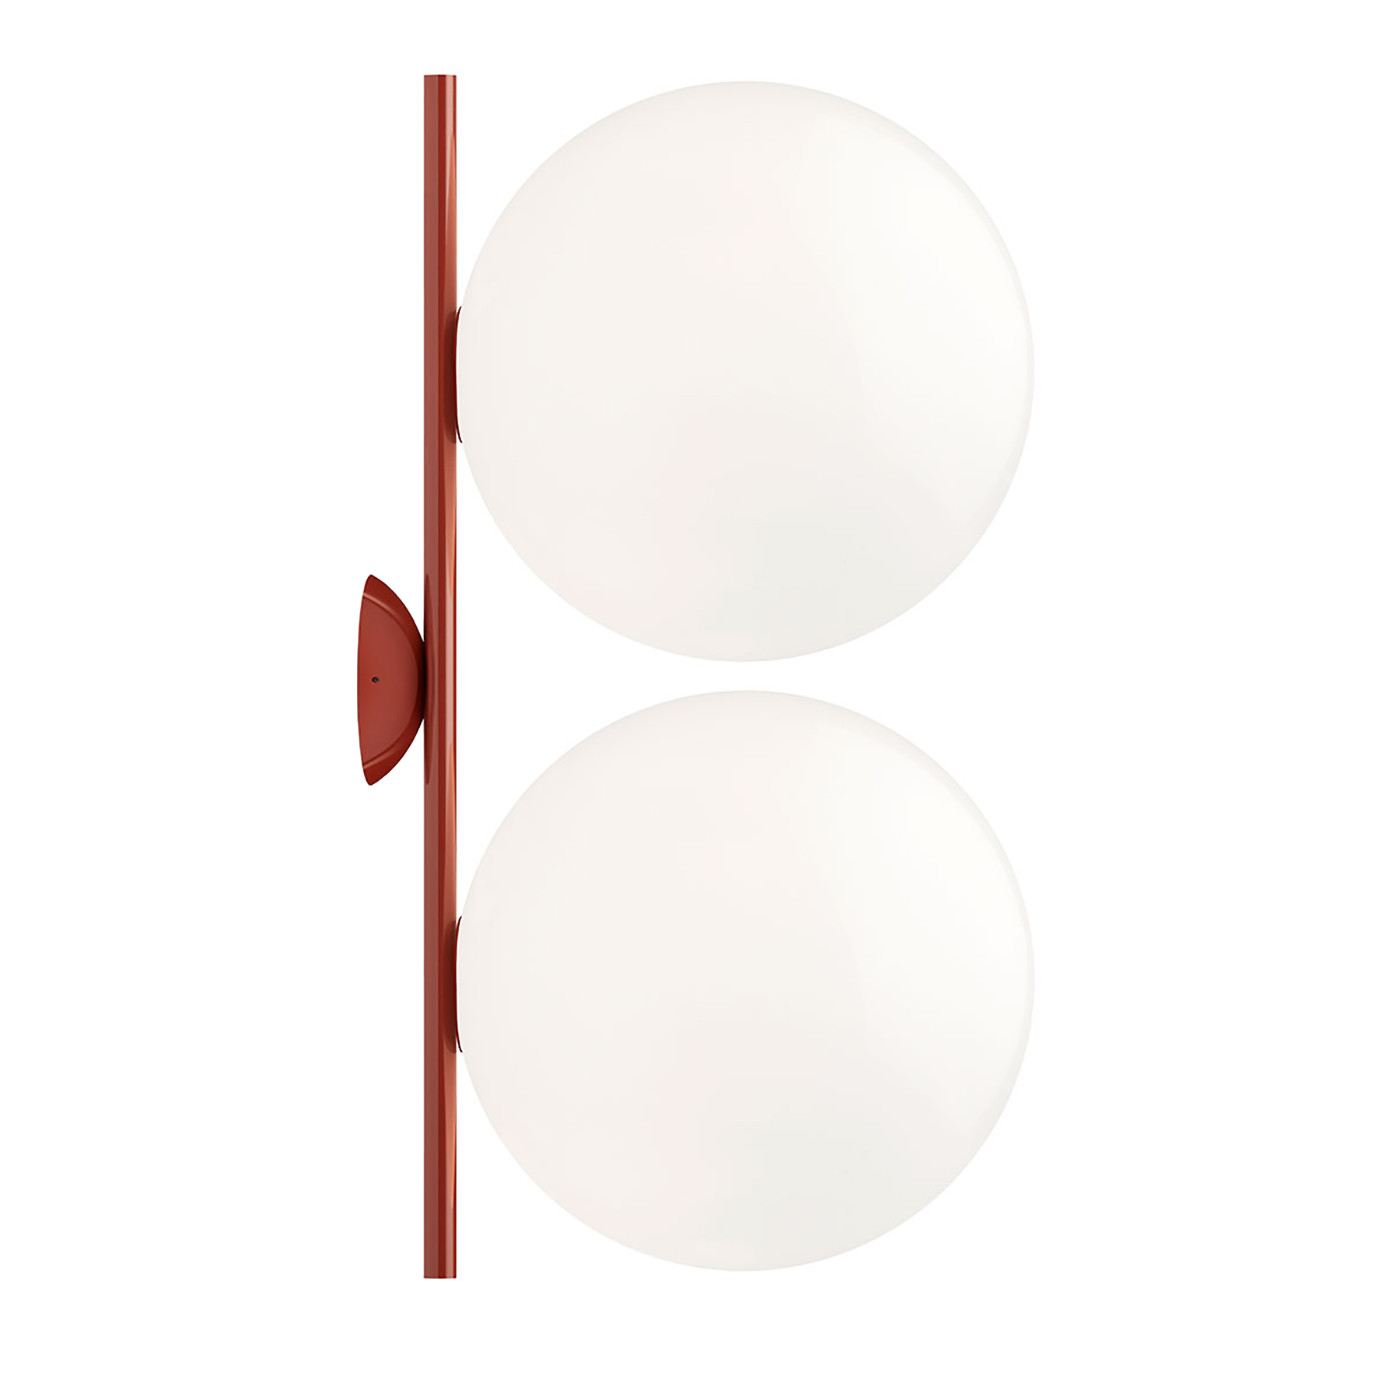 Flos IC Lights C/W2 Double